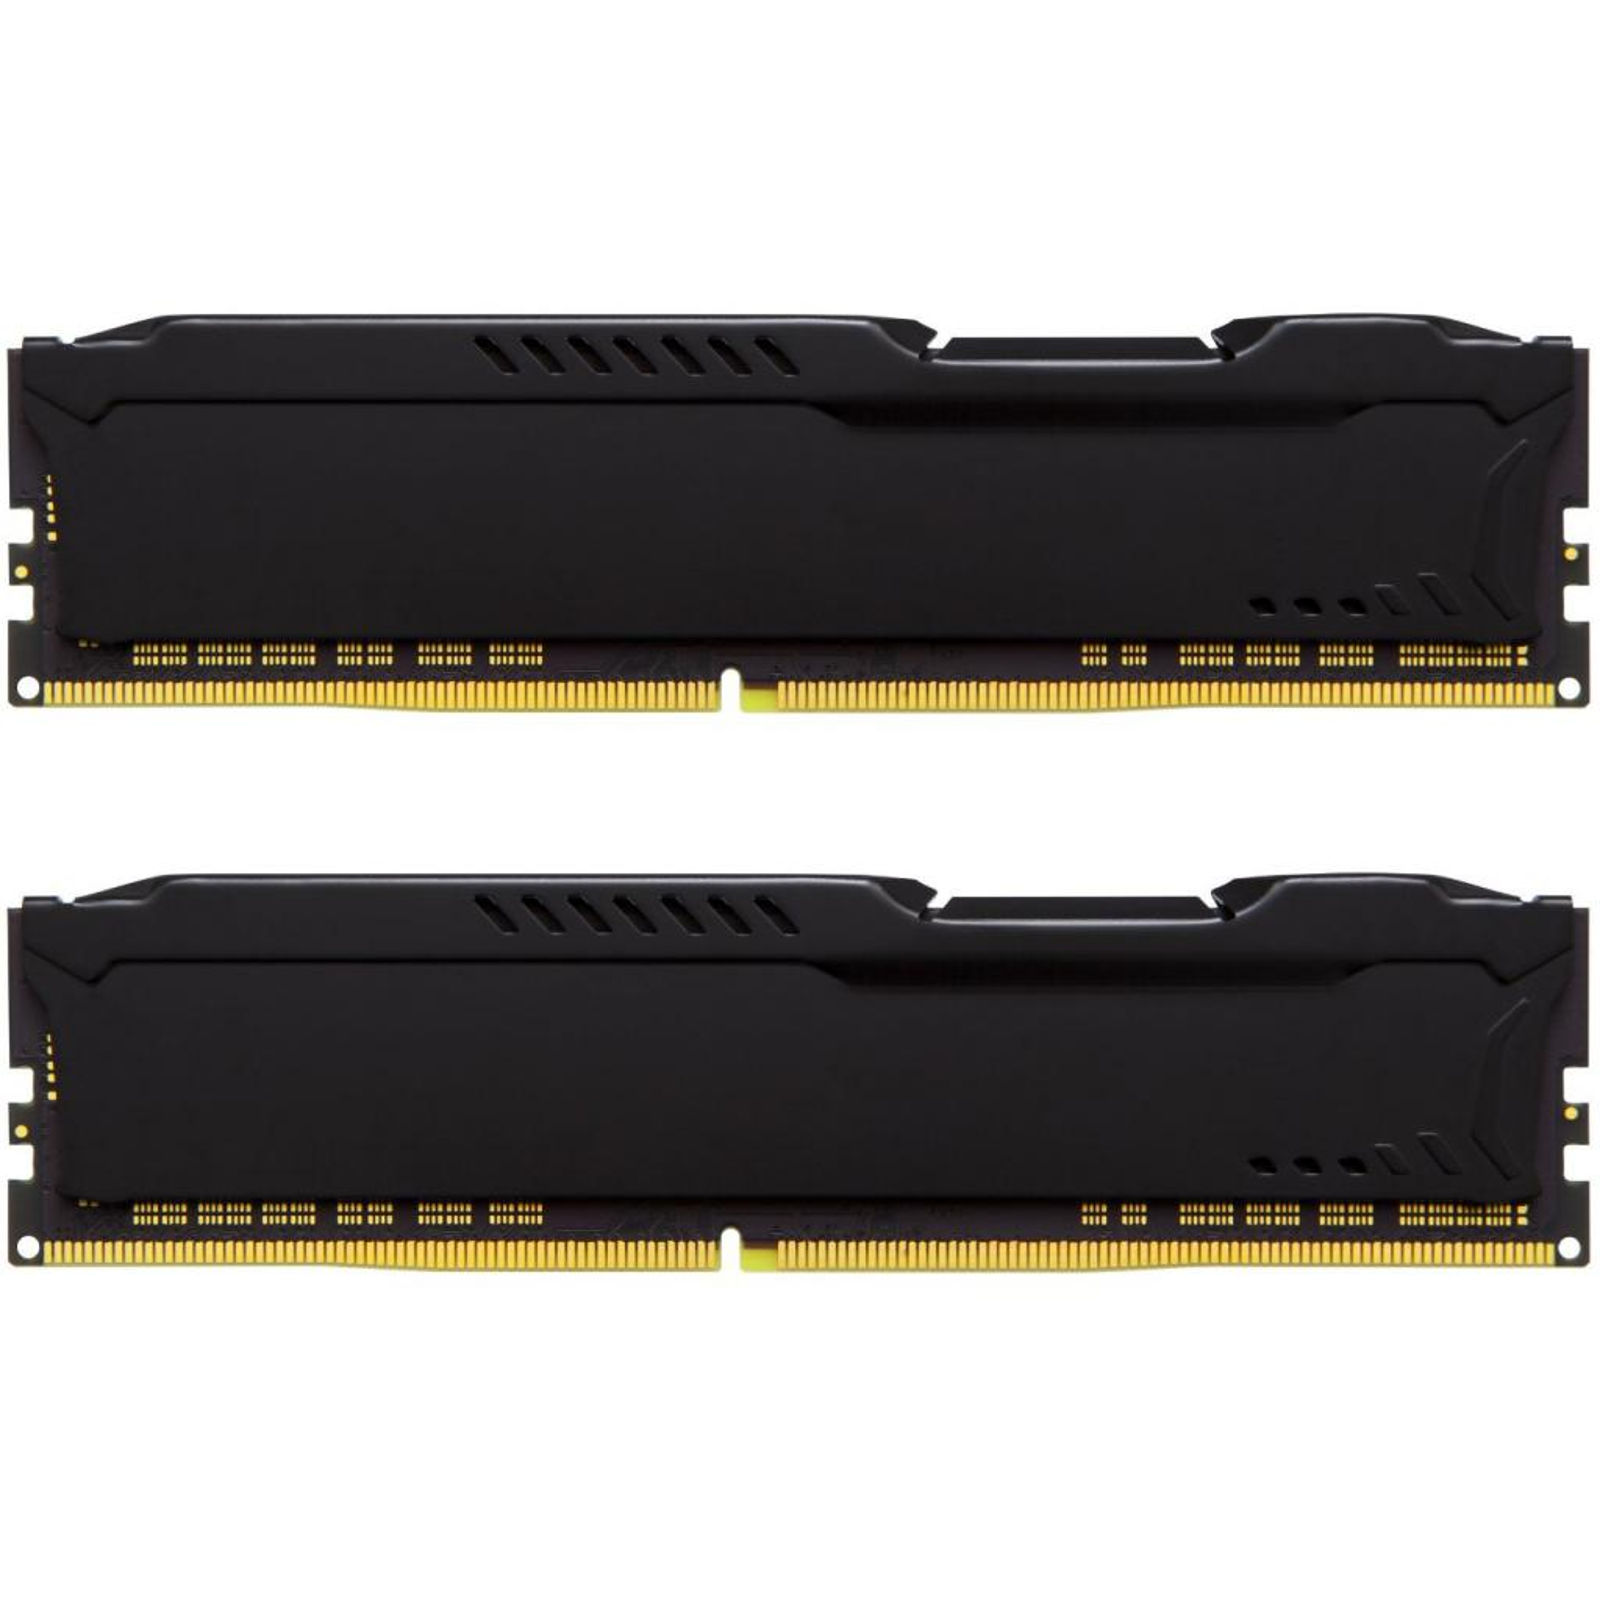 Модуль памяти для компьютера DDR4 32GB (2x16GB) 2400 MHz HyperX FURY Black Kingston (HX424C15FBK2/32) изображение 3